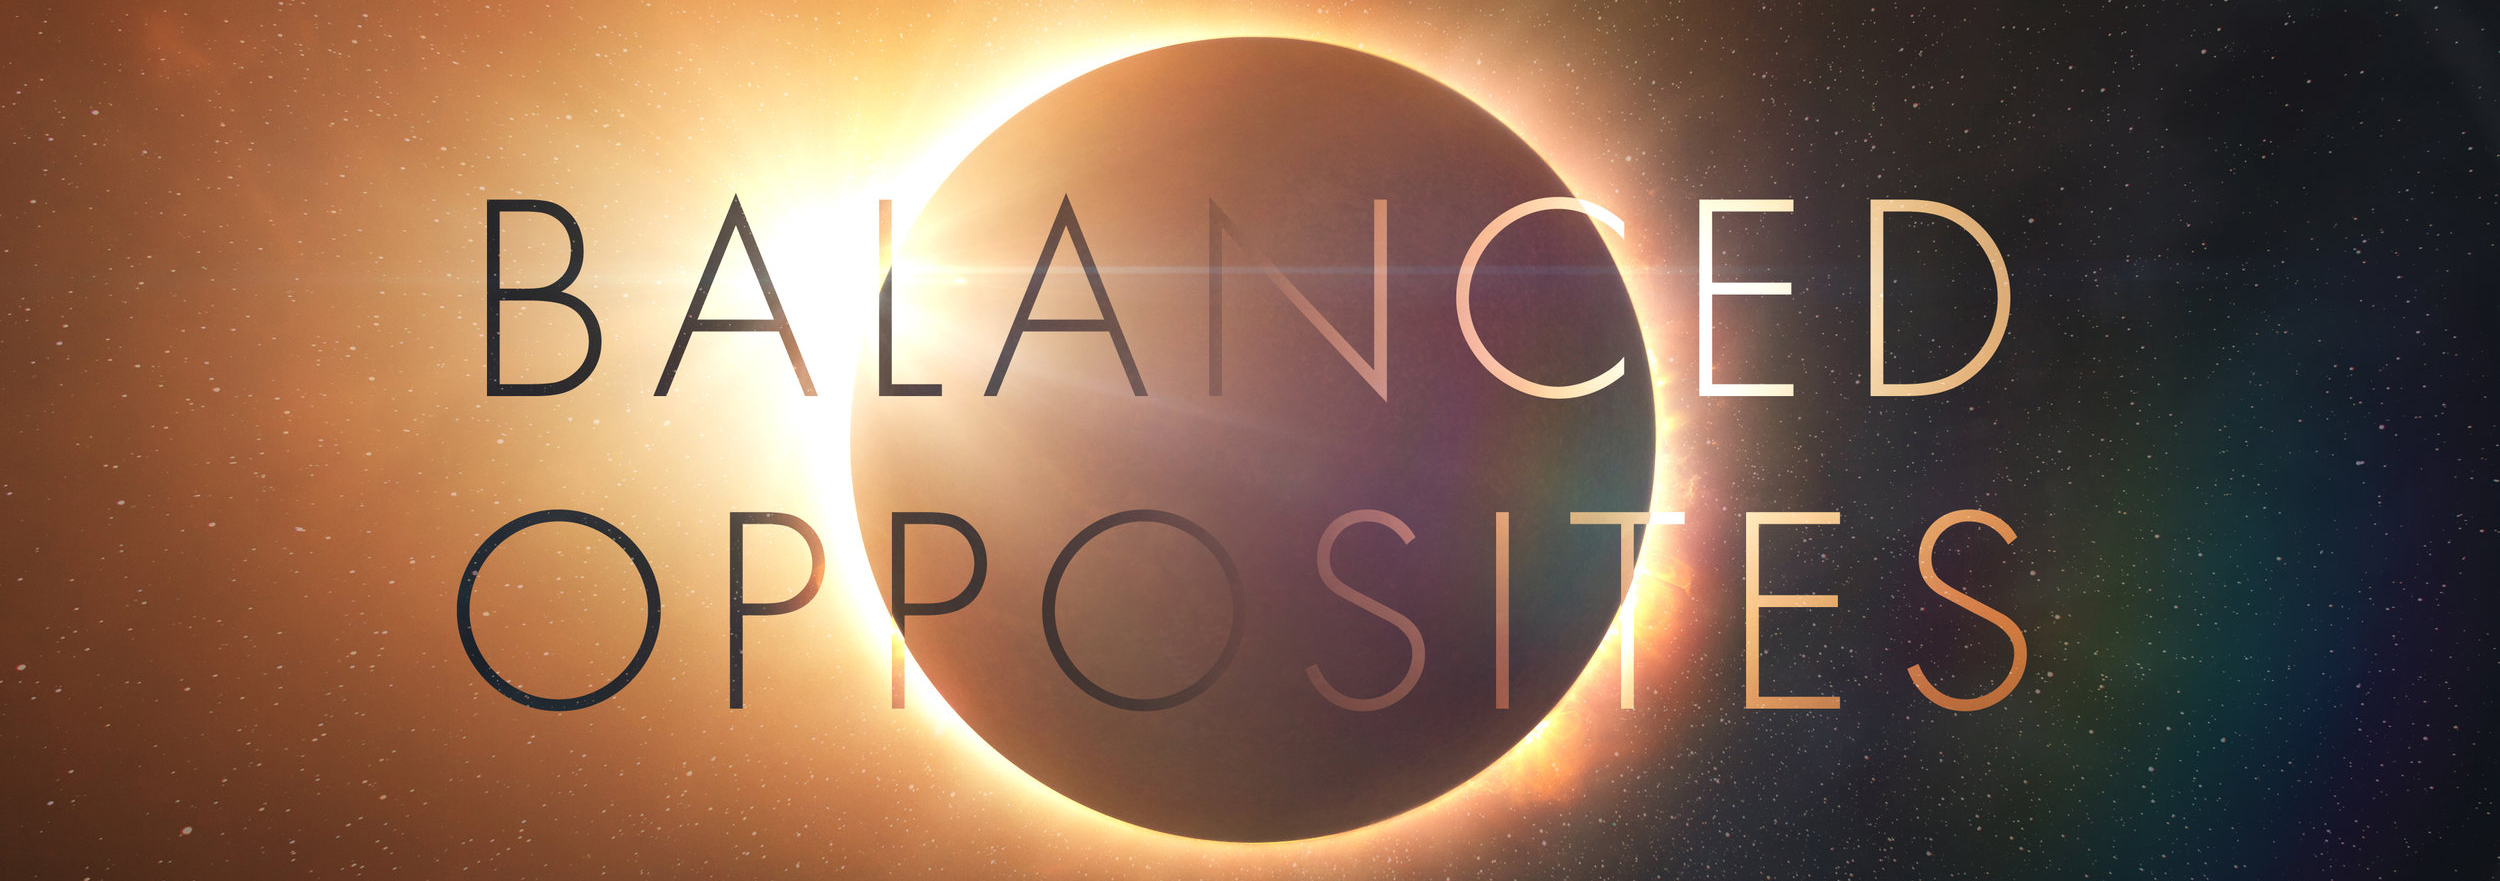 BalanceOfOpposites_thumbnail_v018optics_cropped.jpg